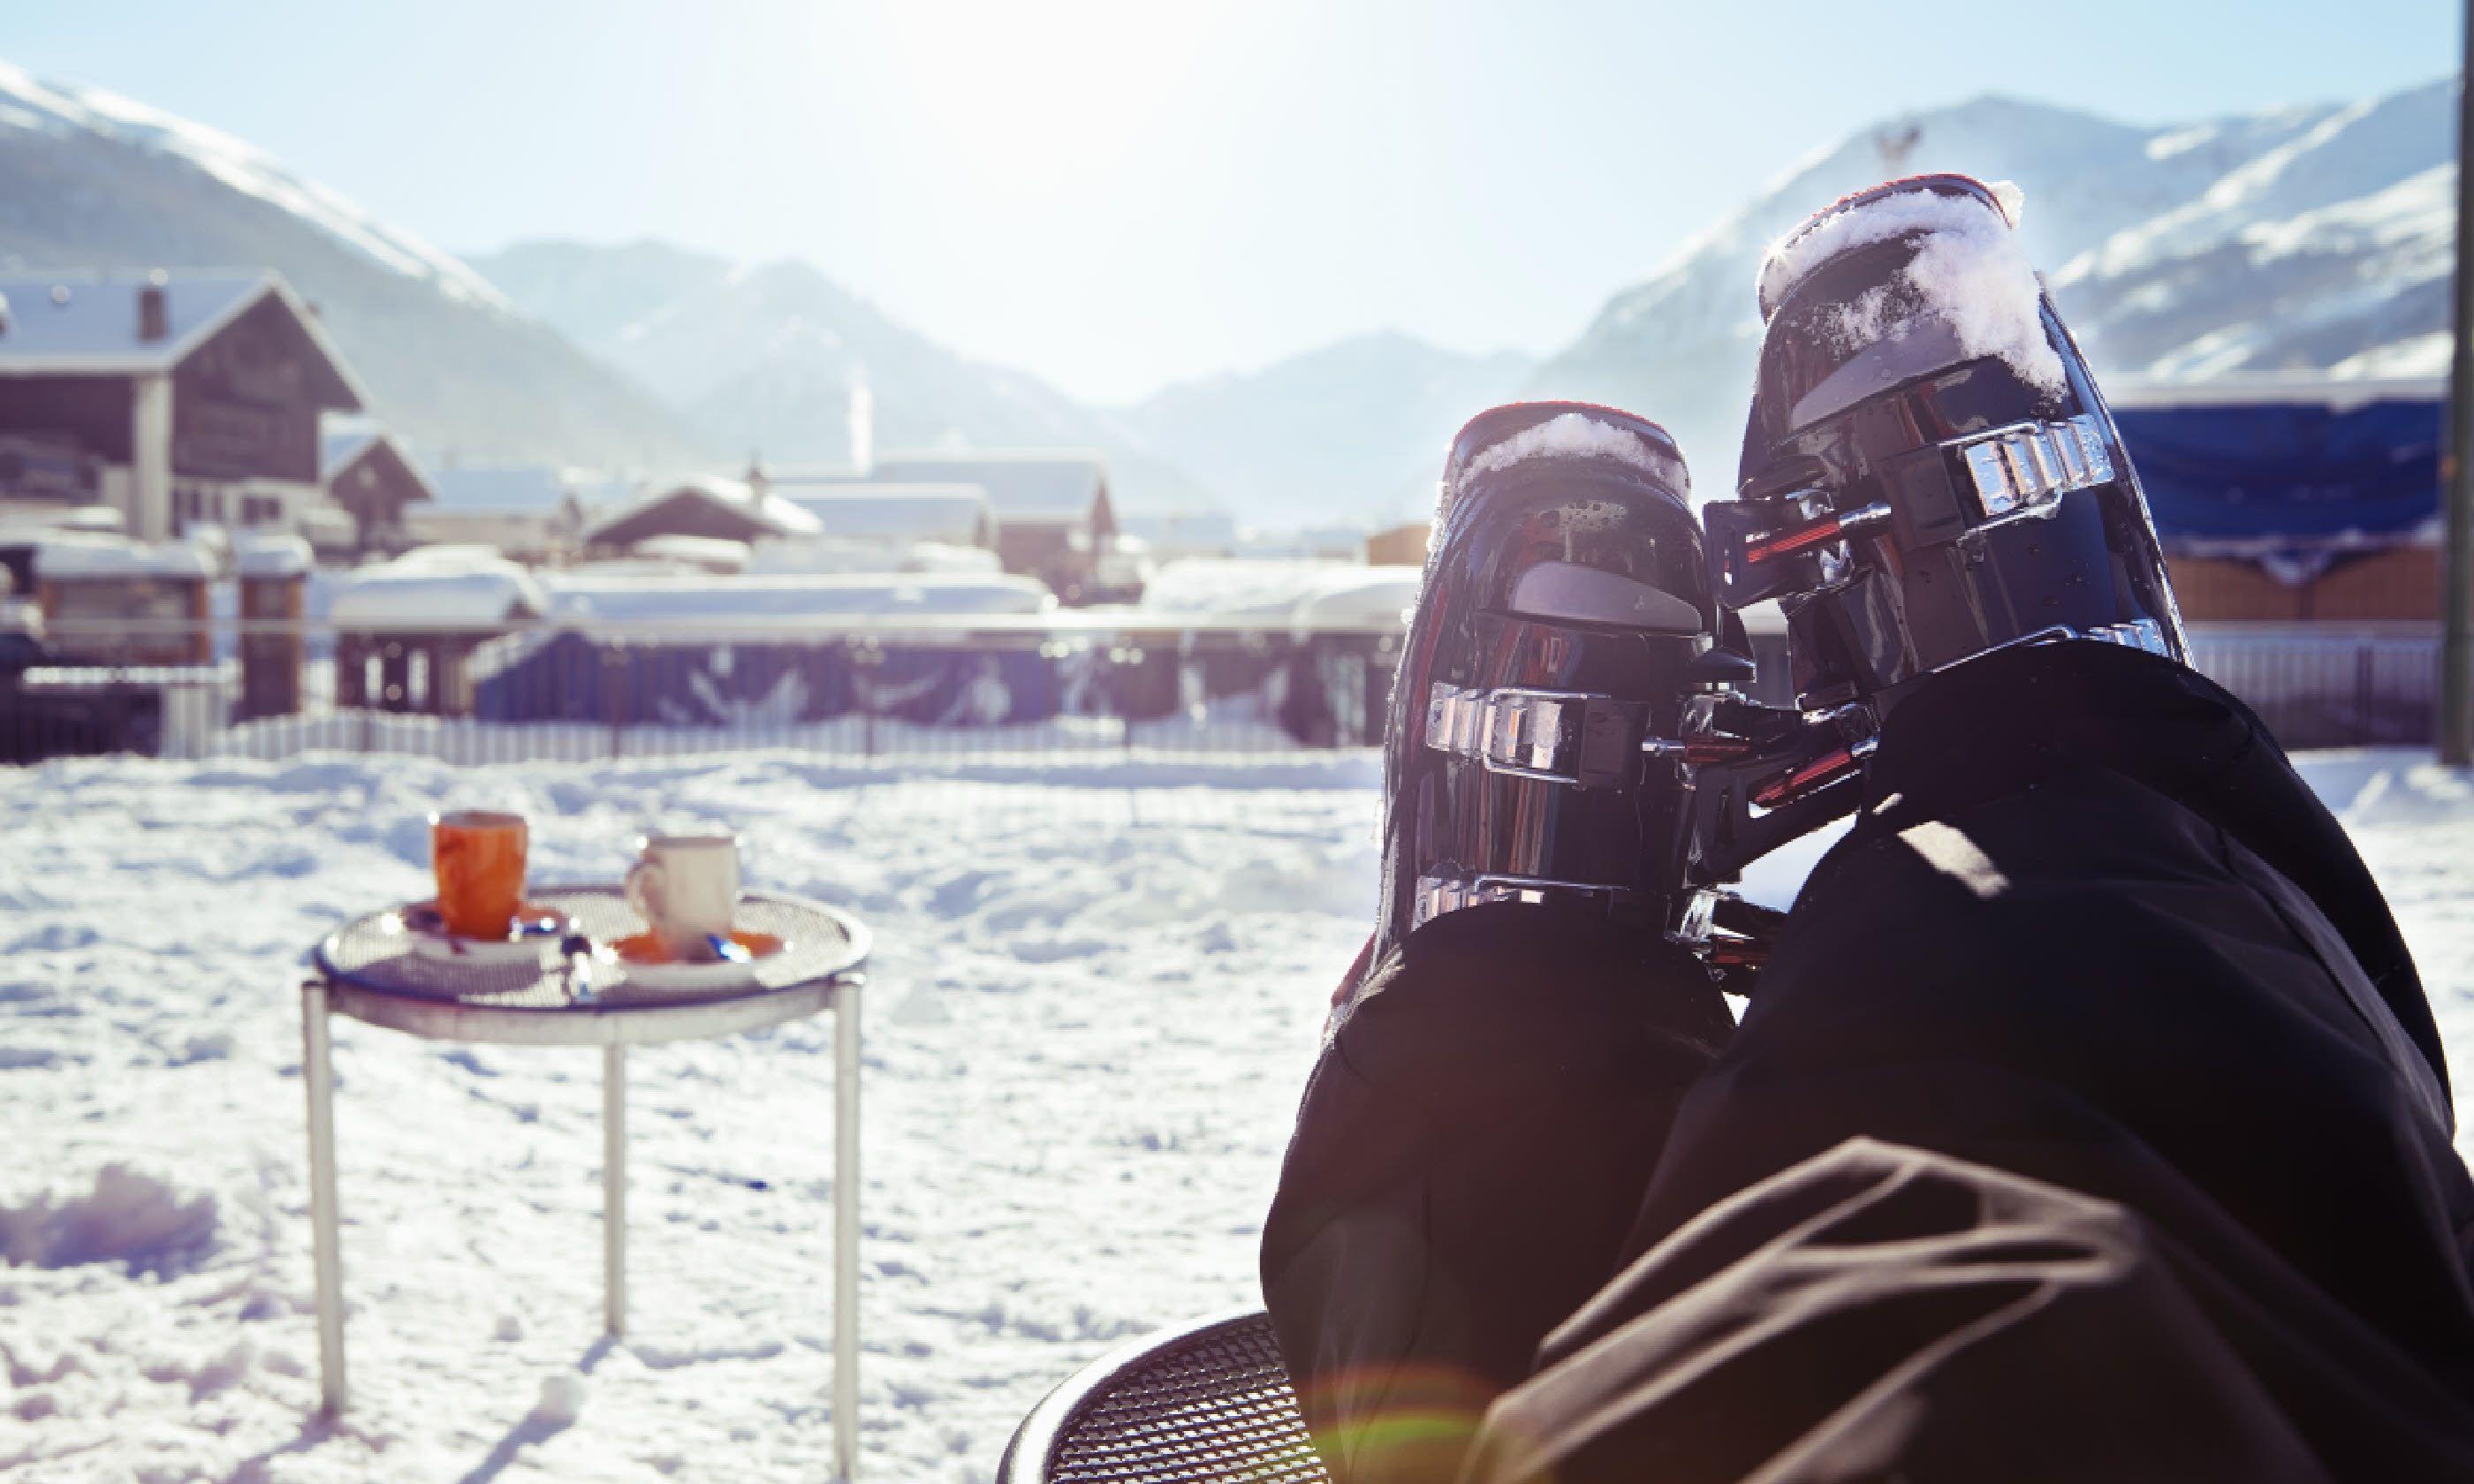 Apres ski, anyone? (Shutterstock)